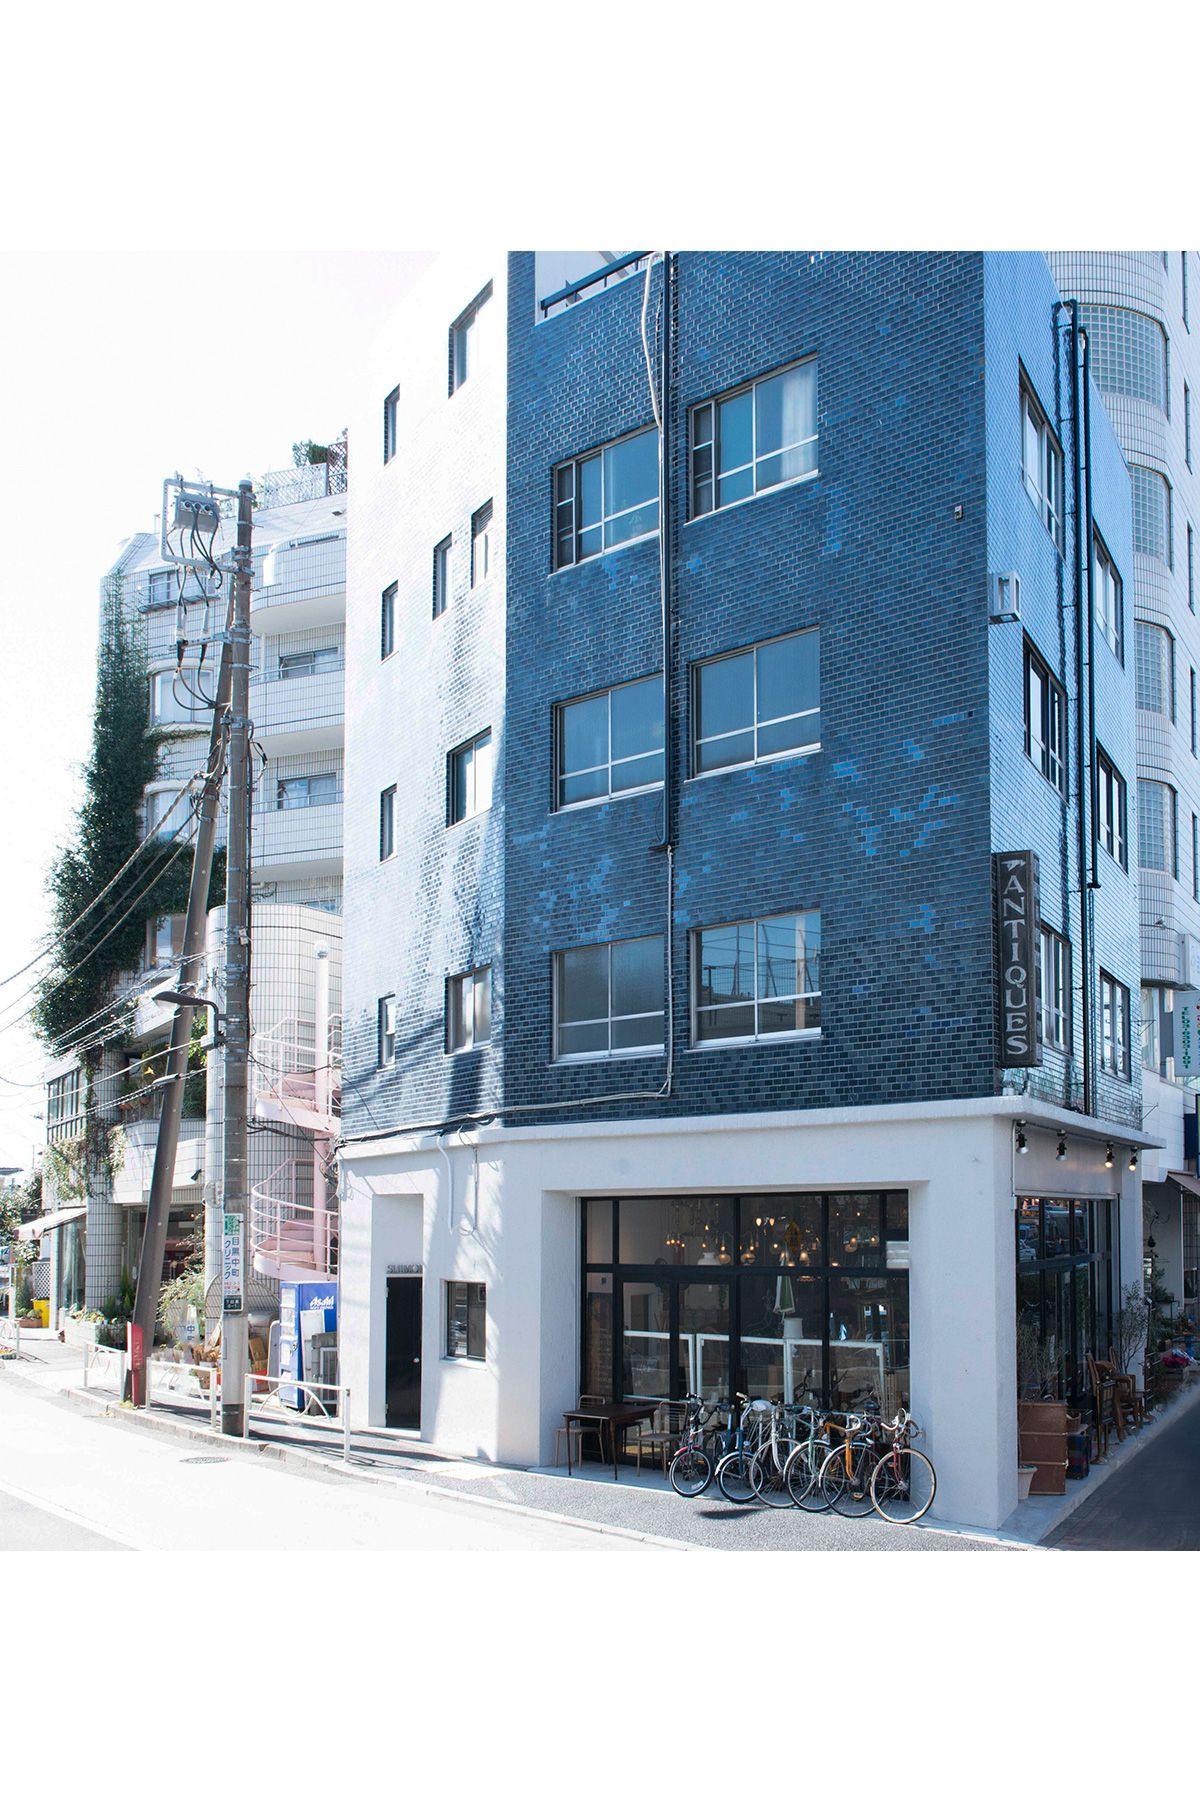 3rd floor(サードフロア)option 建物外観